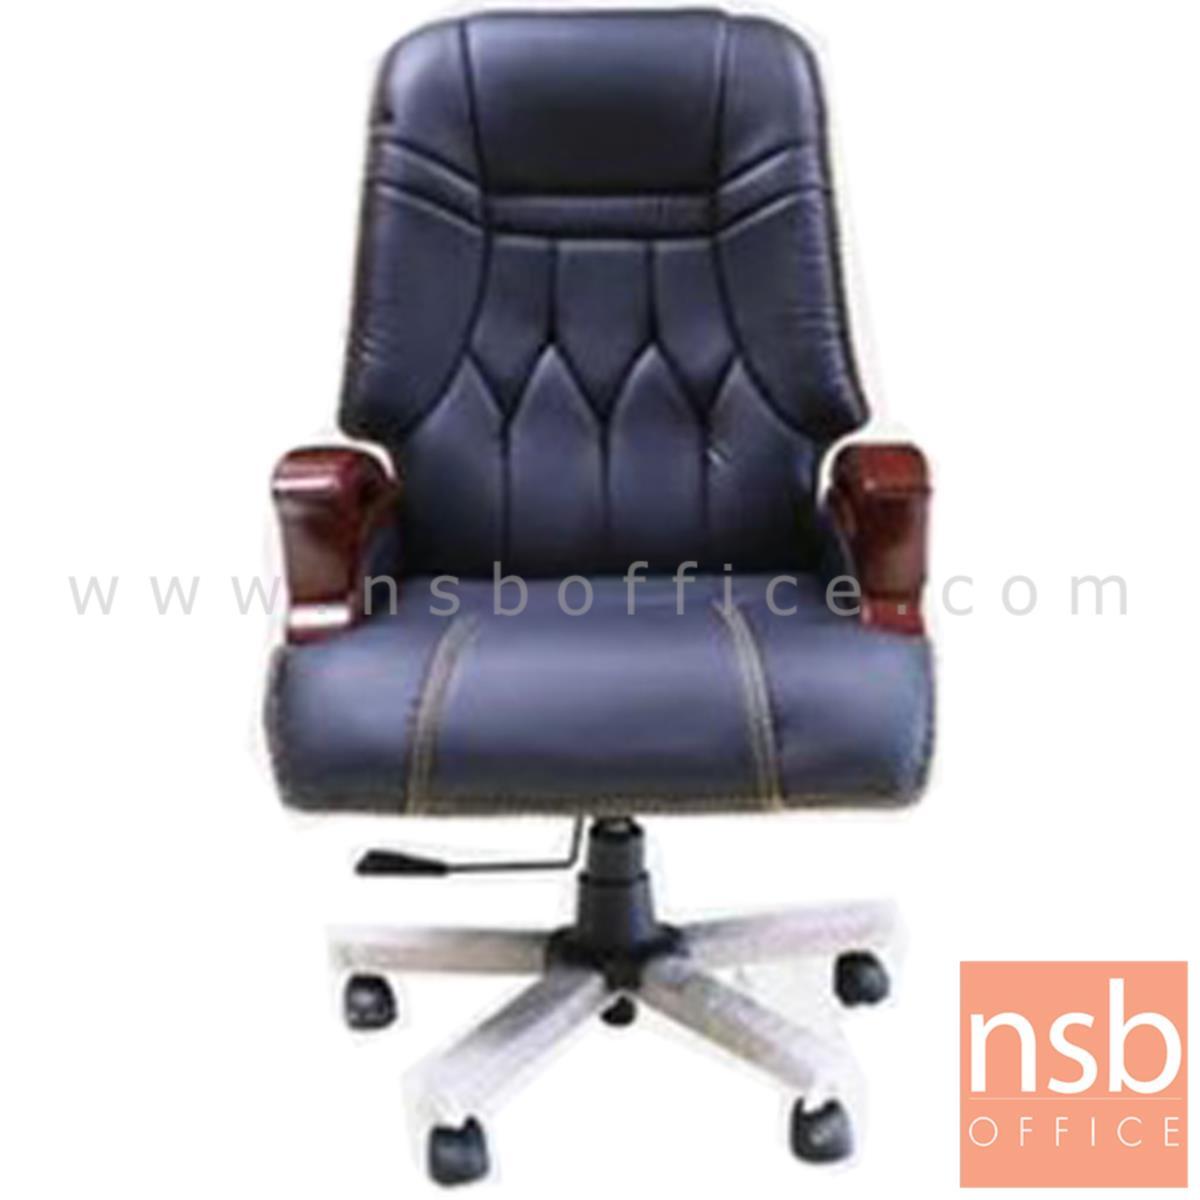 B25A137:เก้าอี้ผู้บริหารหนัง PU  รุ่น AMARANTH (แอมมาแรน)  โช๊คแก๊ส ขาเหล็ก